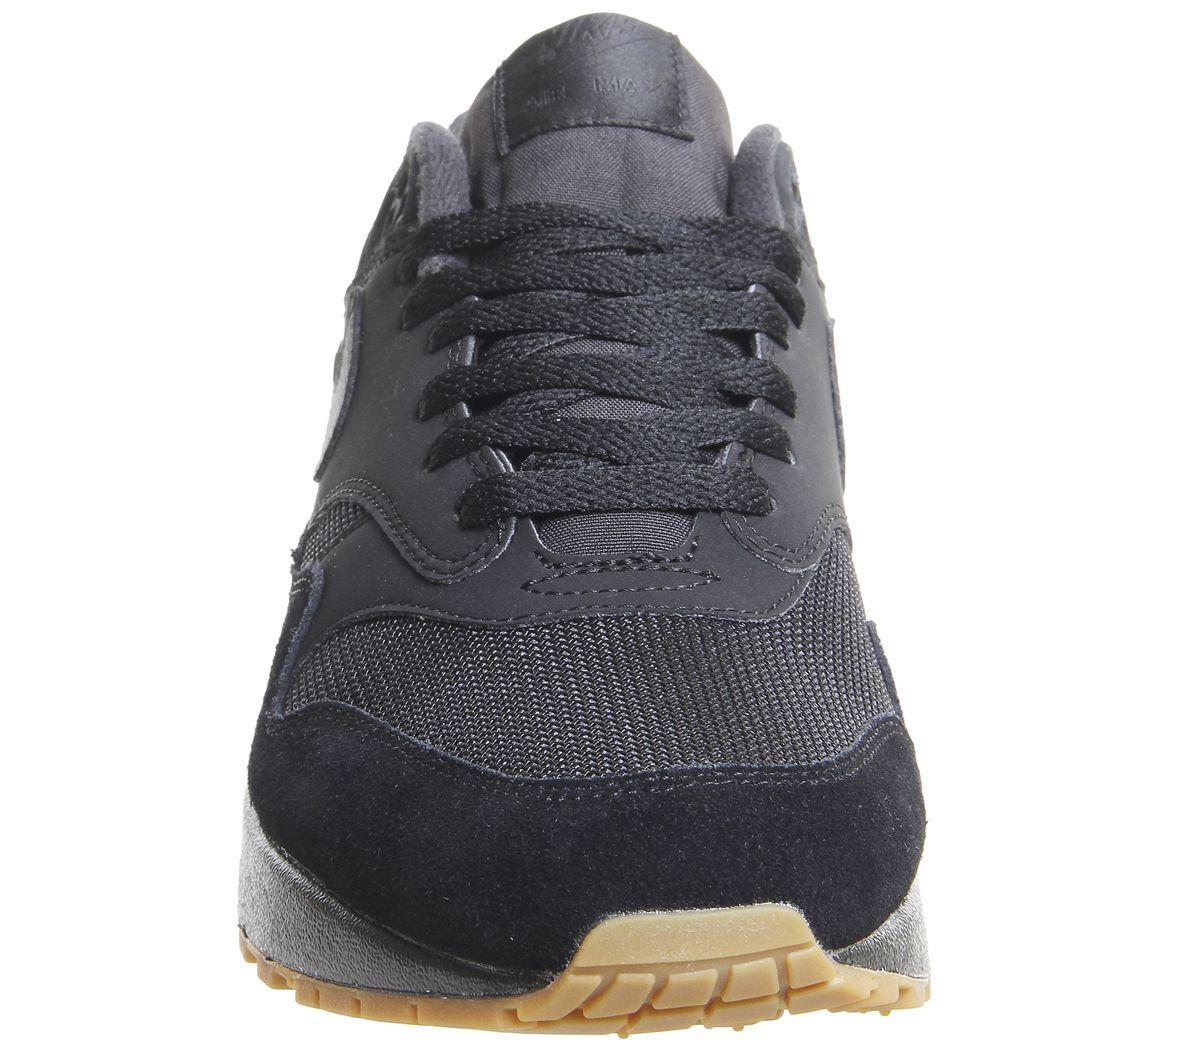 promo code e5353 063dd Nike - Black Air Max 1 Trainers for Men - Lyst. View fullscreen